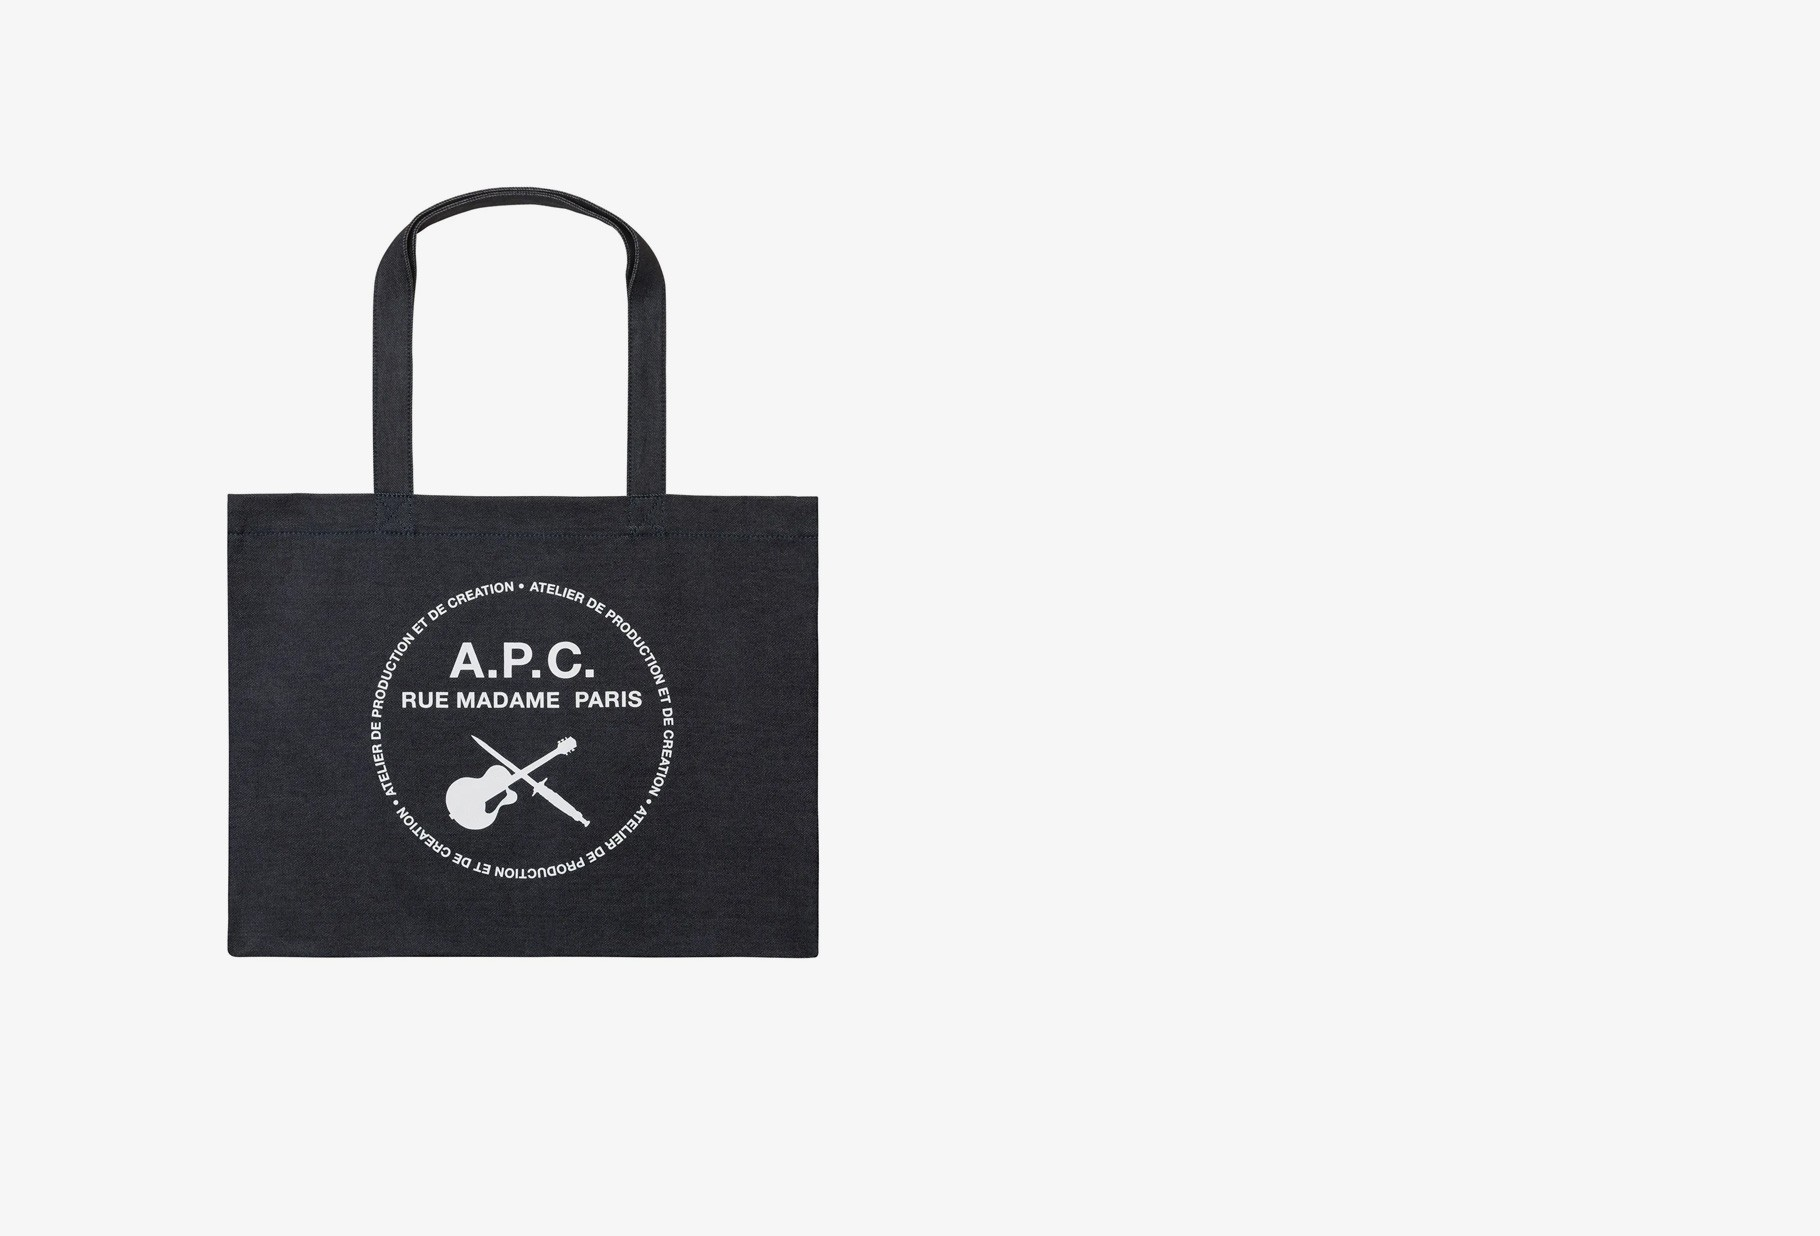 A.P.C. / Shopping guitare poignard Indigo